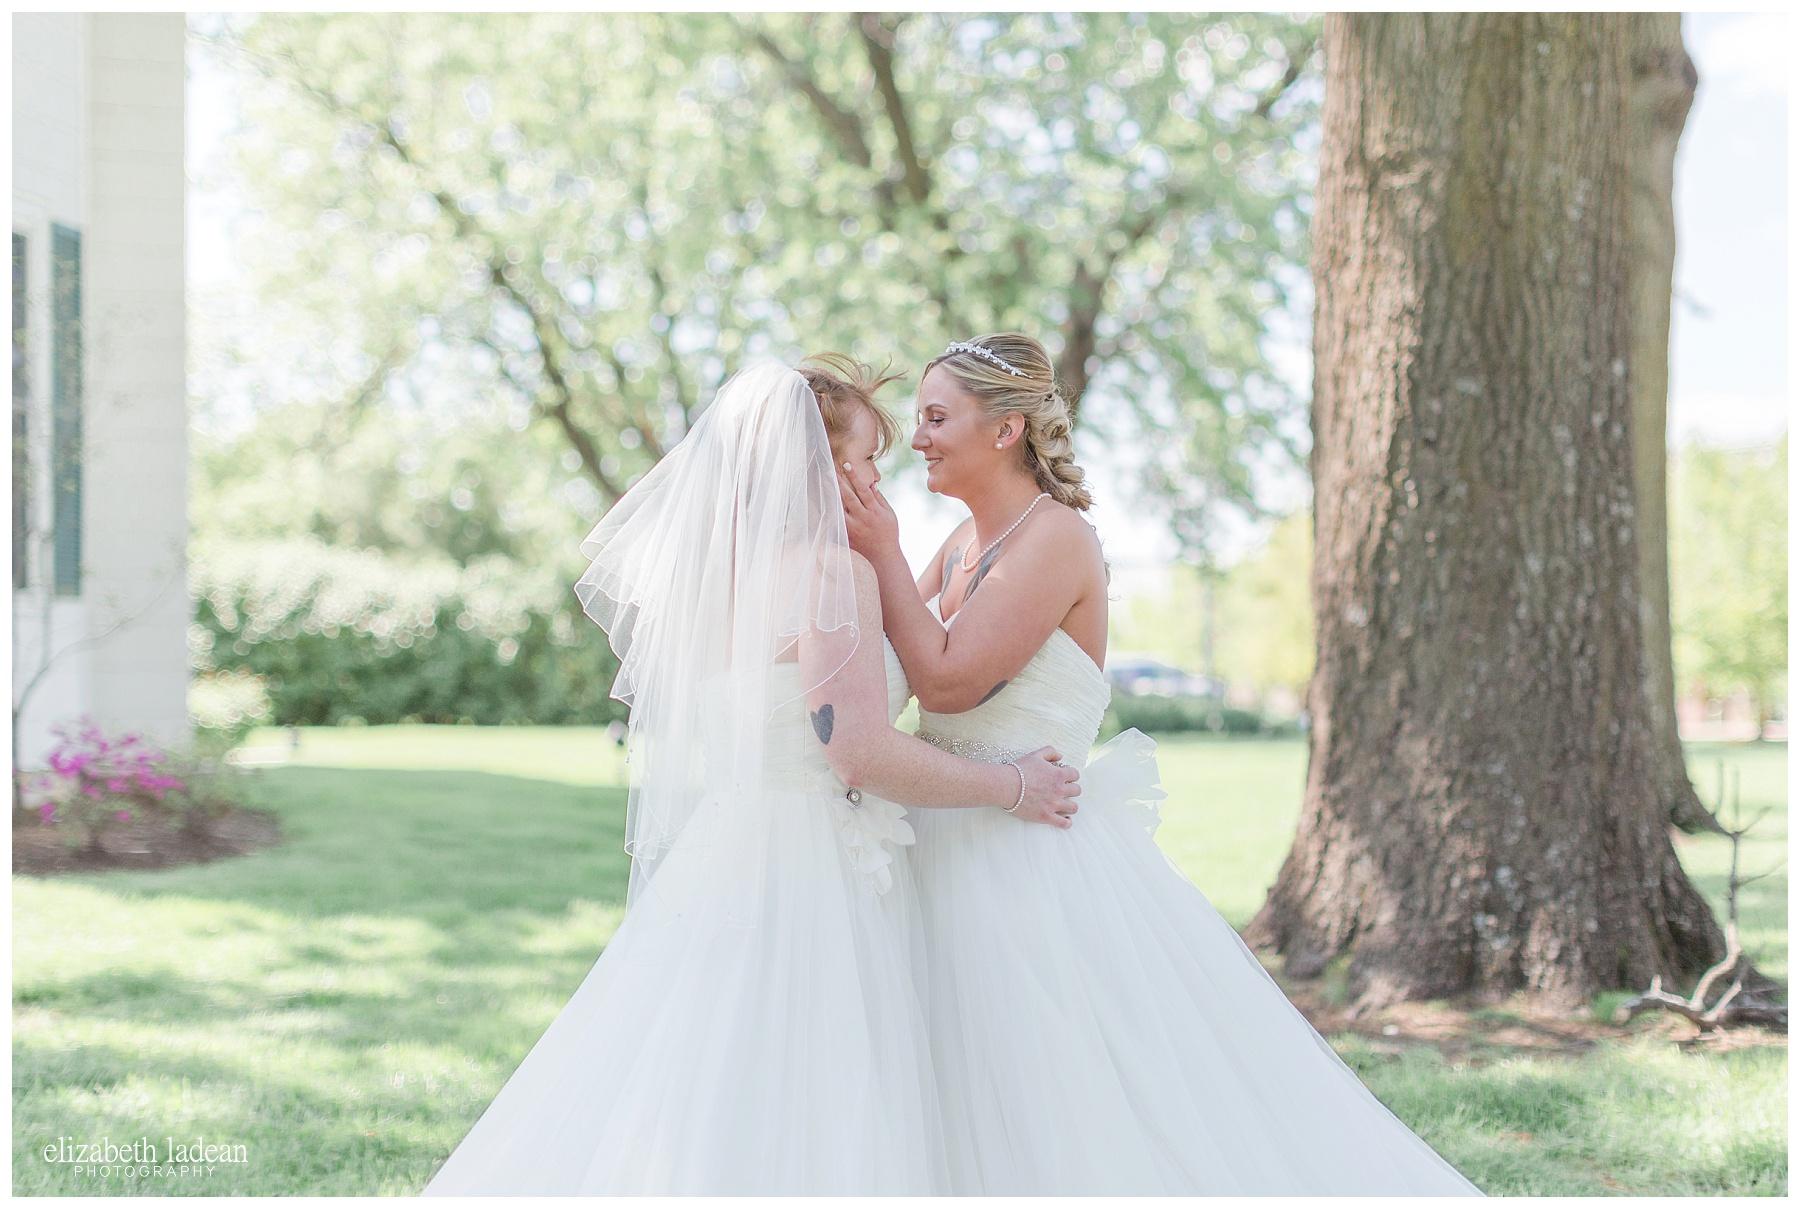 Thompson-Barn-Kansas-Wedding-Photography-R+J-0505-Elizabeth-Ladean-Photography-photo_0676.jpg